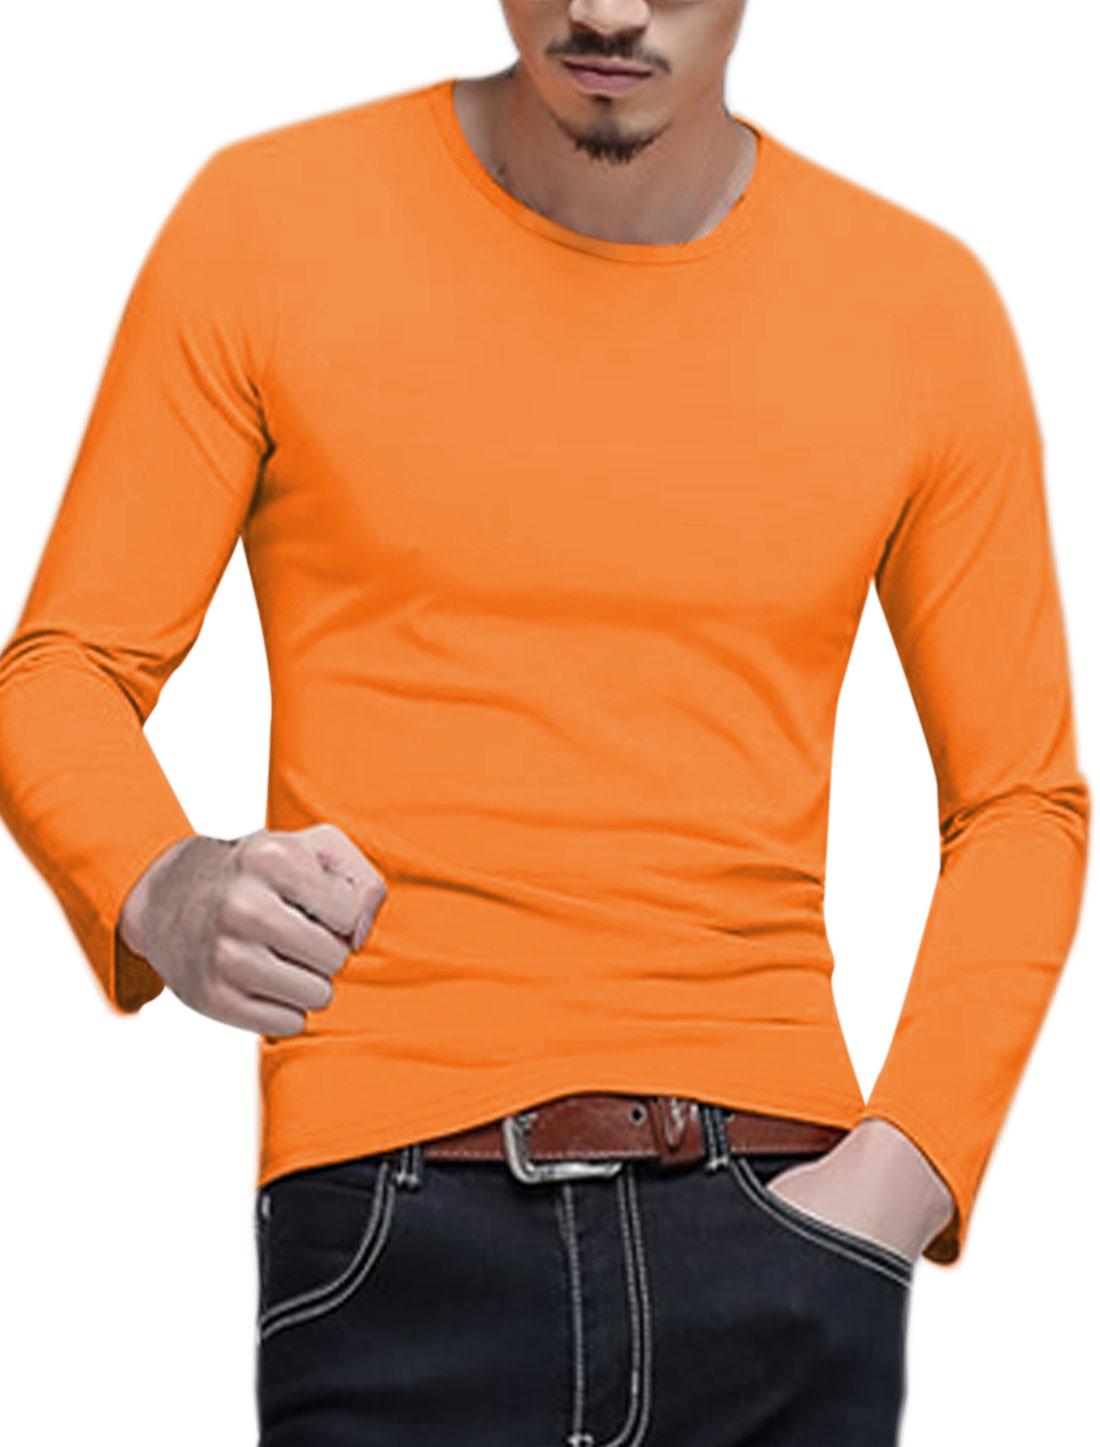 Men Long Sleeves Crew Neck Slim Fit Tee Shirt Orange M